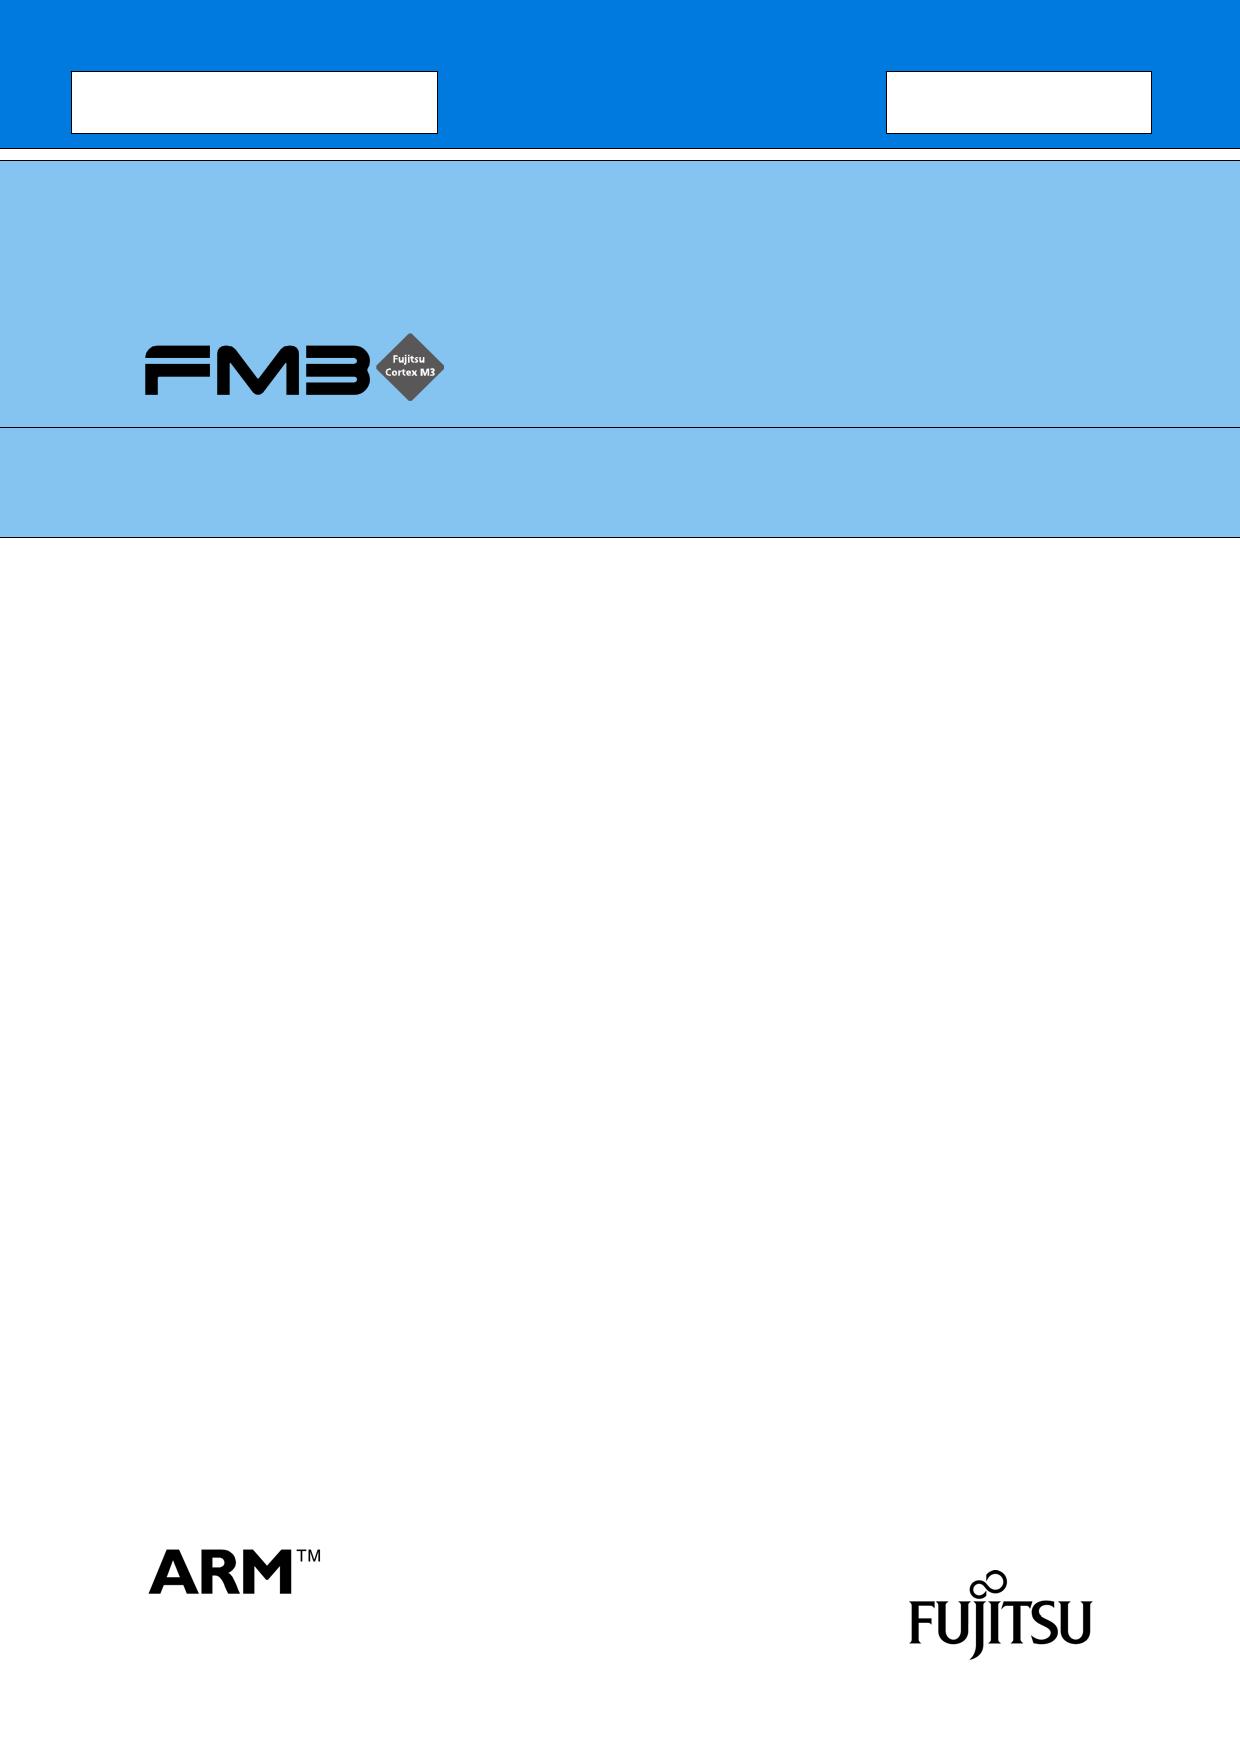 MB9BF321L 데이터시트 및 MB9BF321L PDF